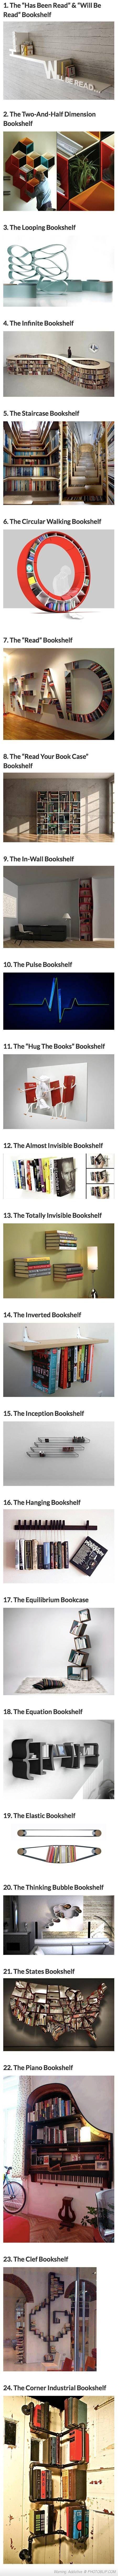 Cool And Creative Bookshelves